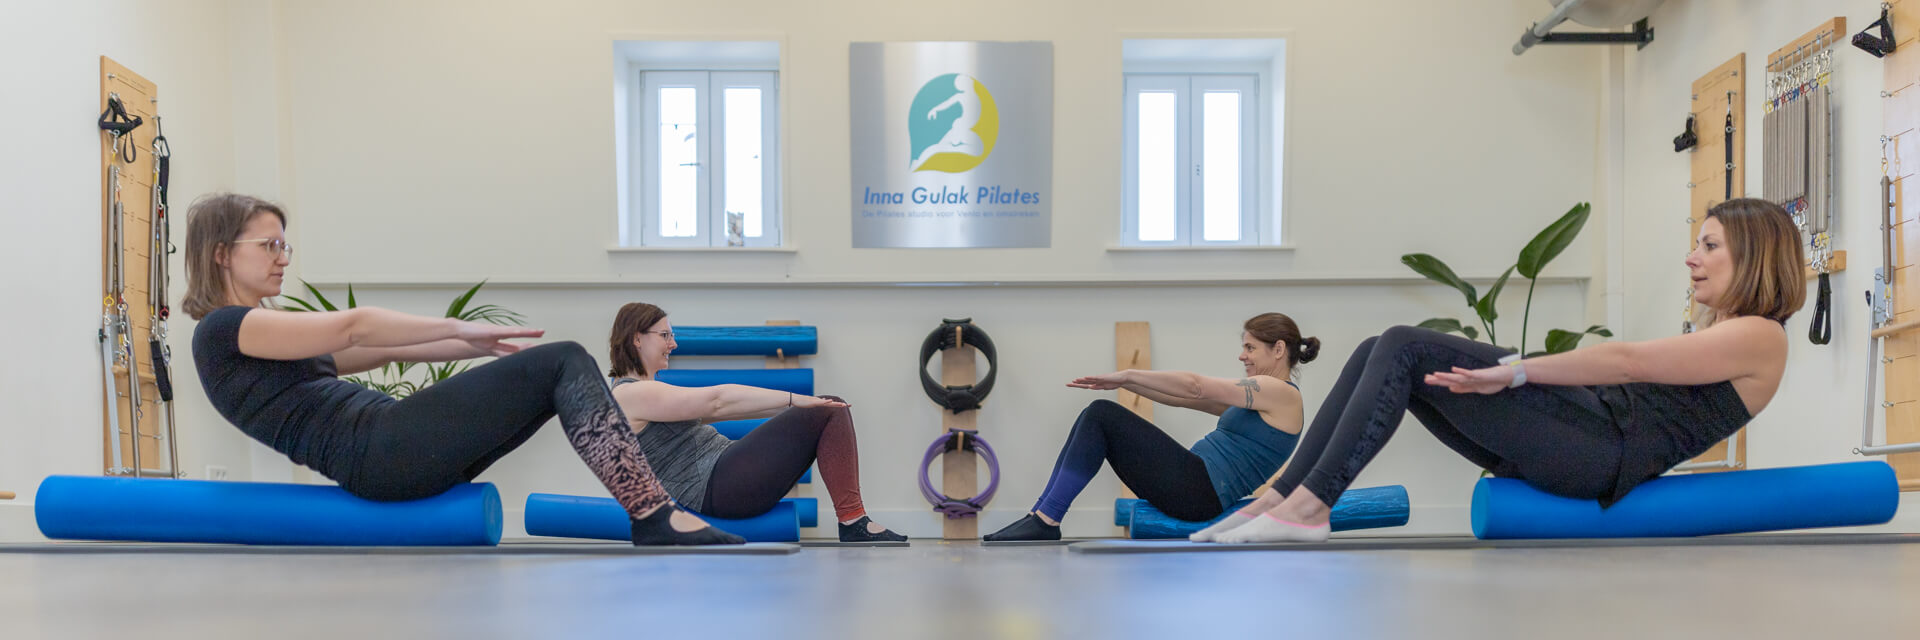 Inna-Gulak-inna-Gulak-Pilates-Pilates-venlo-Pilates-groepslessen-Personal-Training-Pilates-Reformer-Pilates-Mat-01